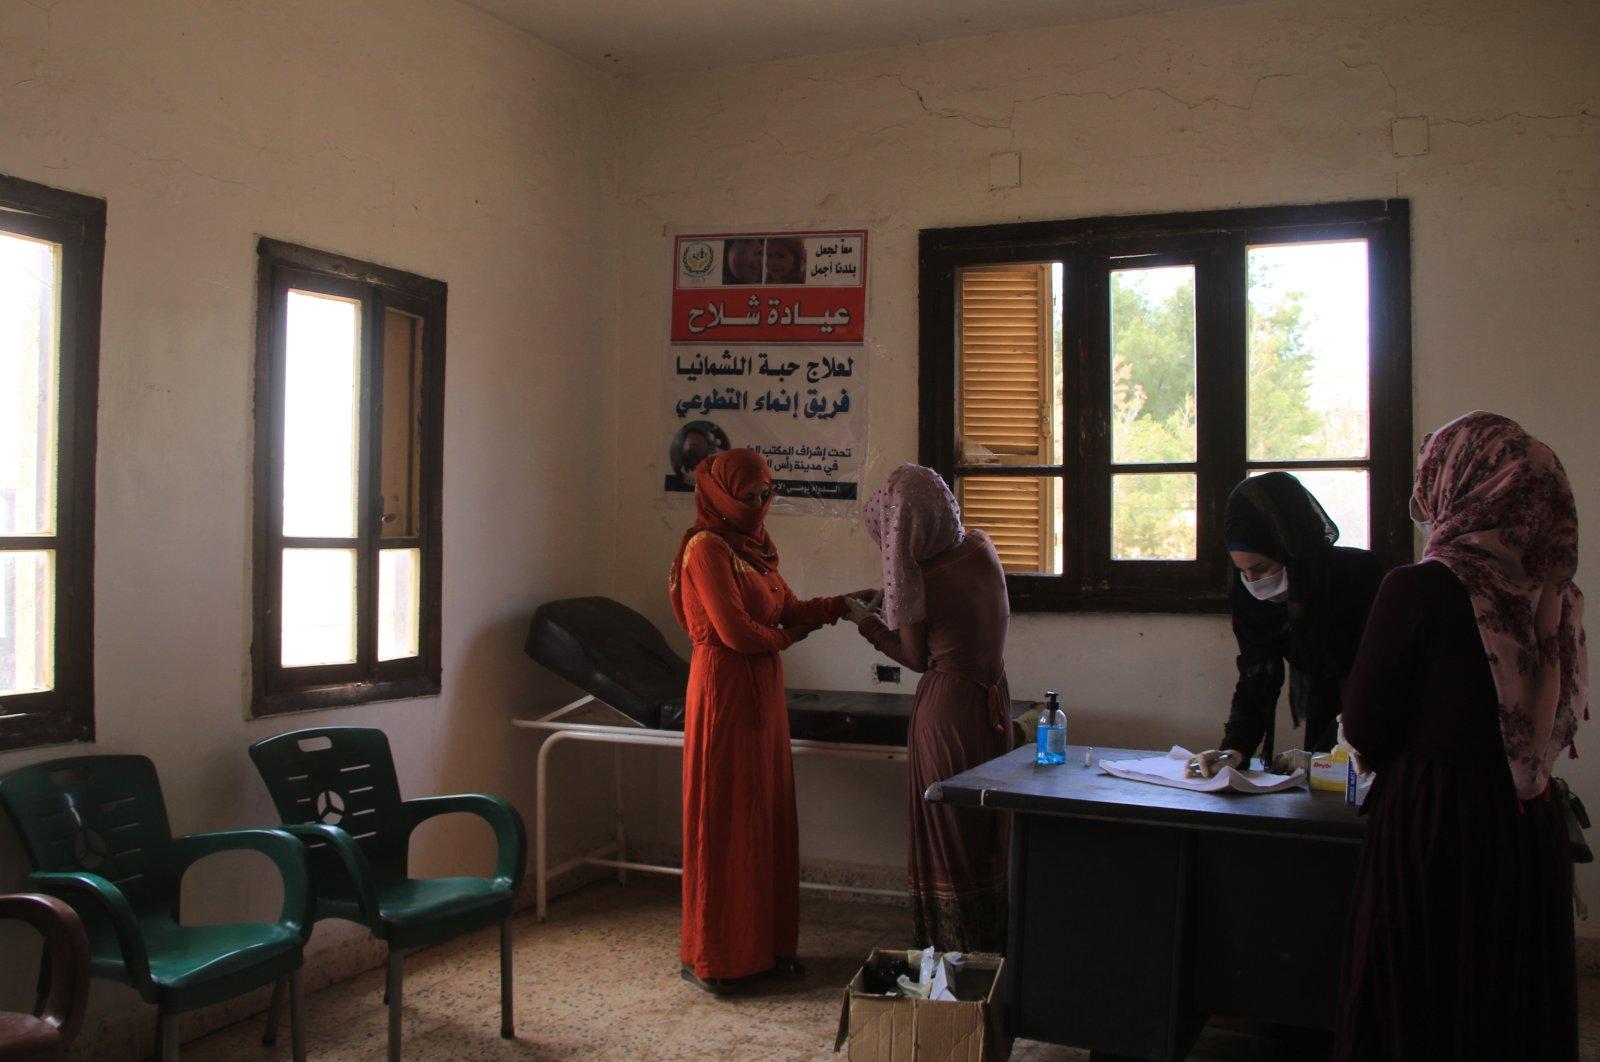 A health clinic in northern Syria's Ras al-Ain, June 9, 2021. (AA Photo)